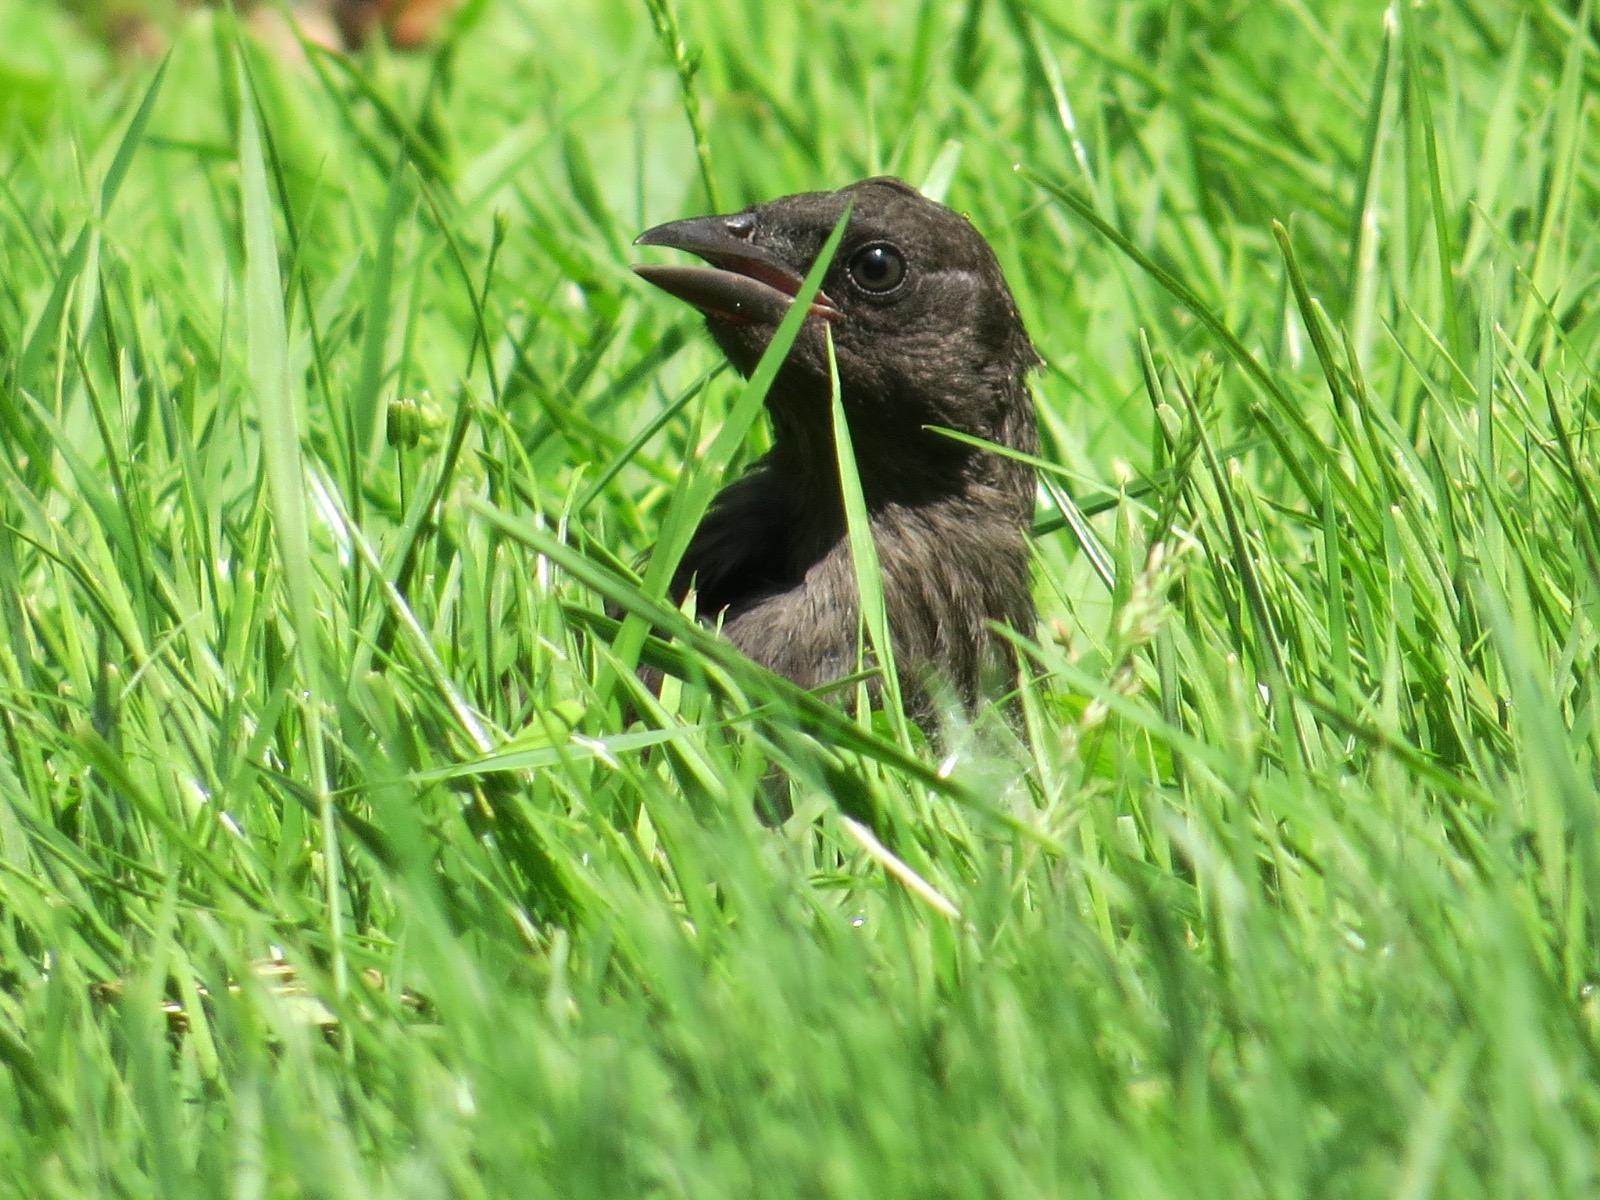 birding backyard and beyond